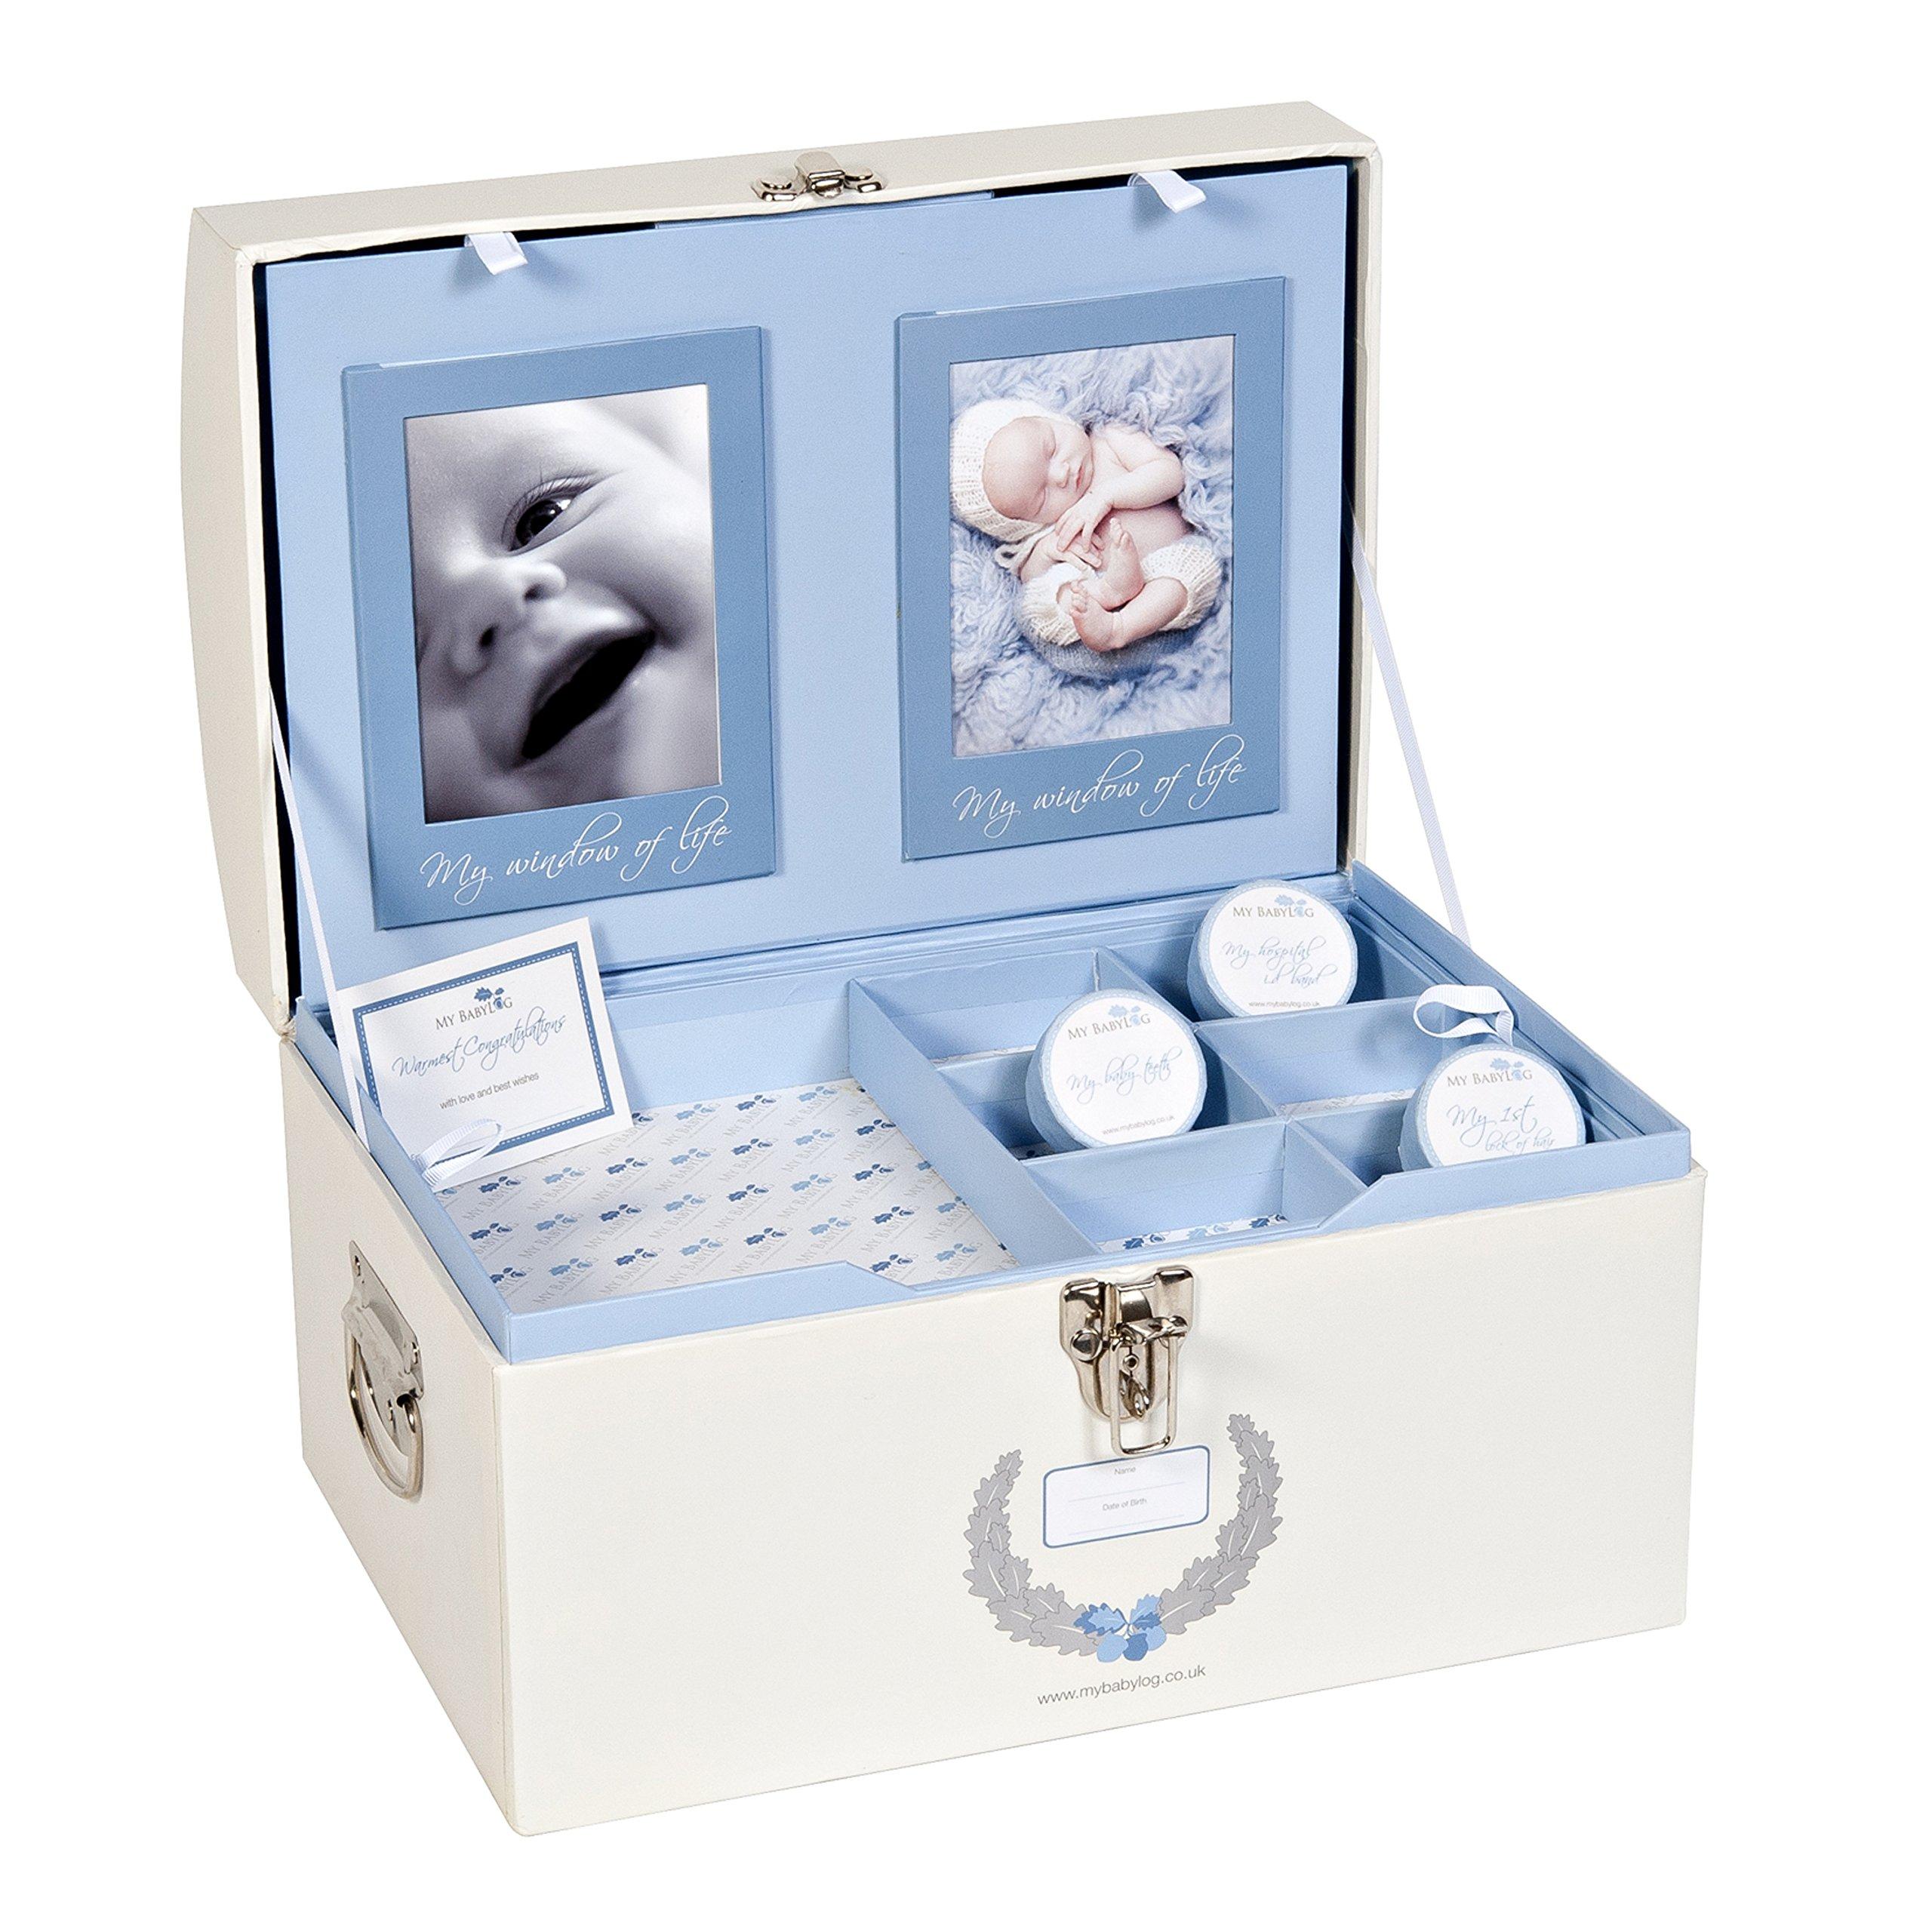 Mybabylog Baby Boys Memory Keepsake Box